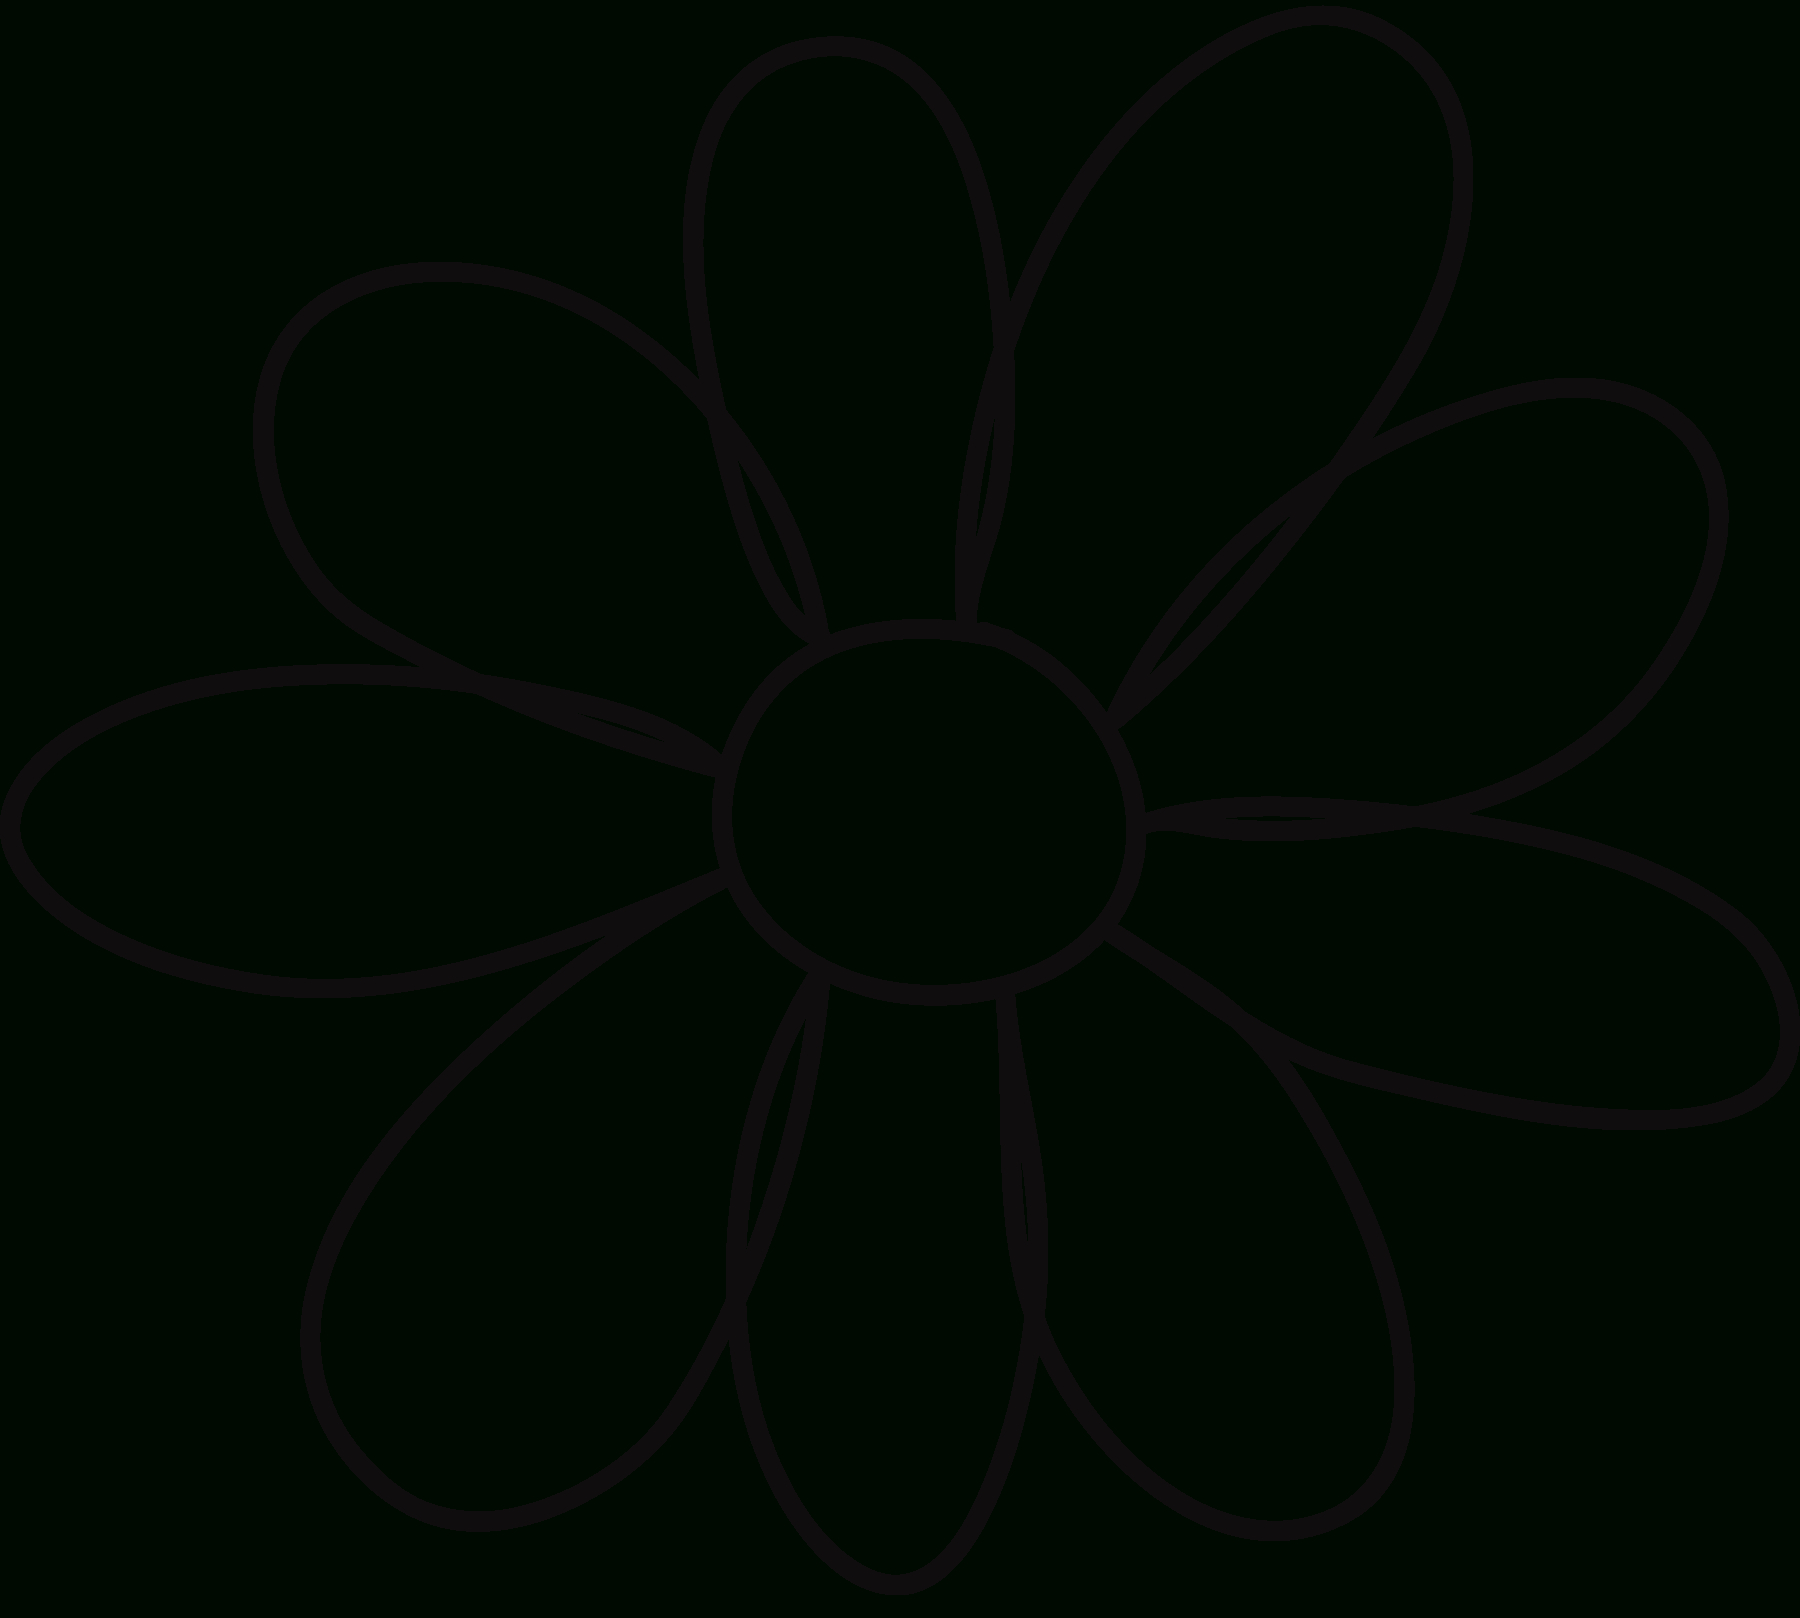 10 Petal Flower Template - Clipart Best - Clipart Best | Quilting - Free Printable Sunflower Template